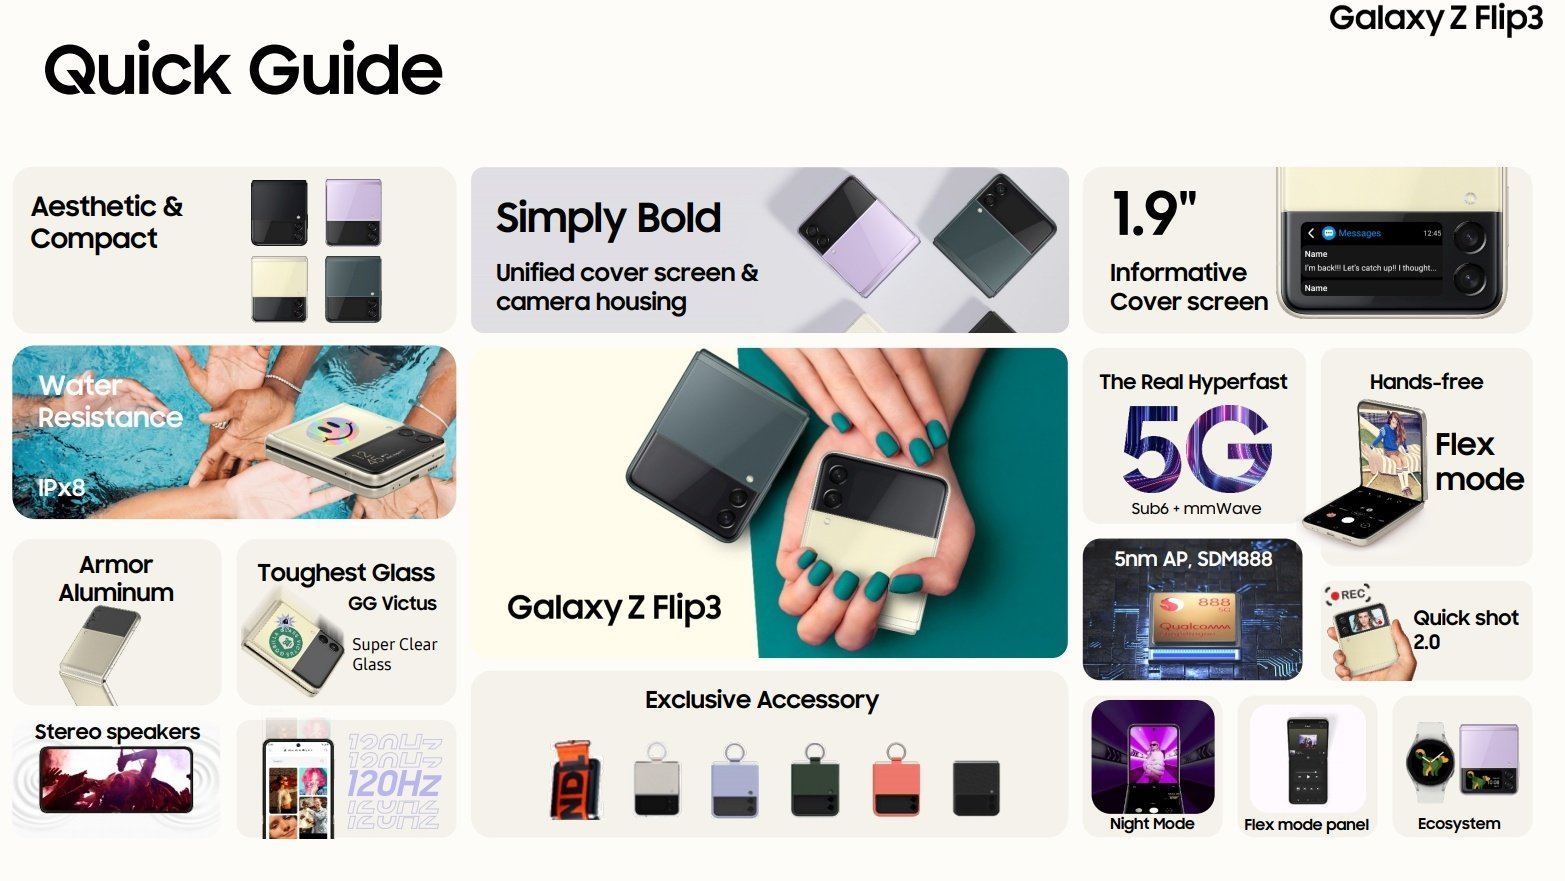 Samsung Galaxy Z Flip 3 - Specification (Rumored)